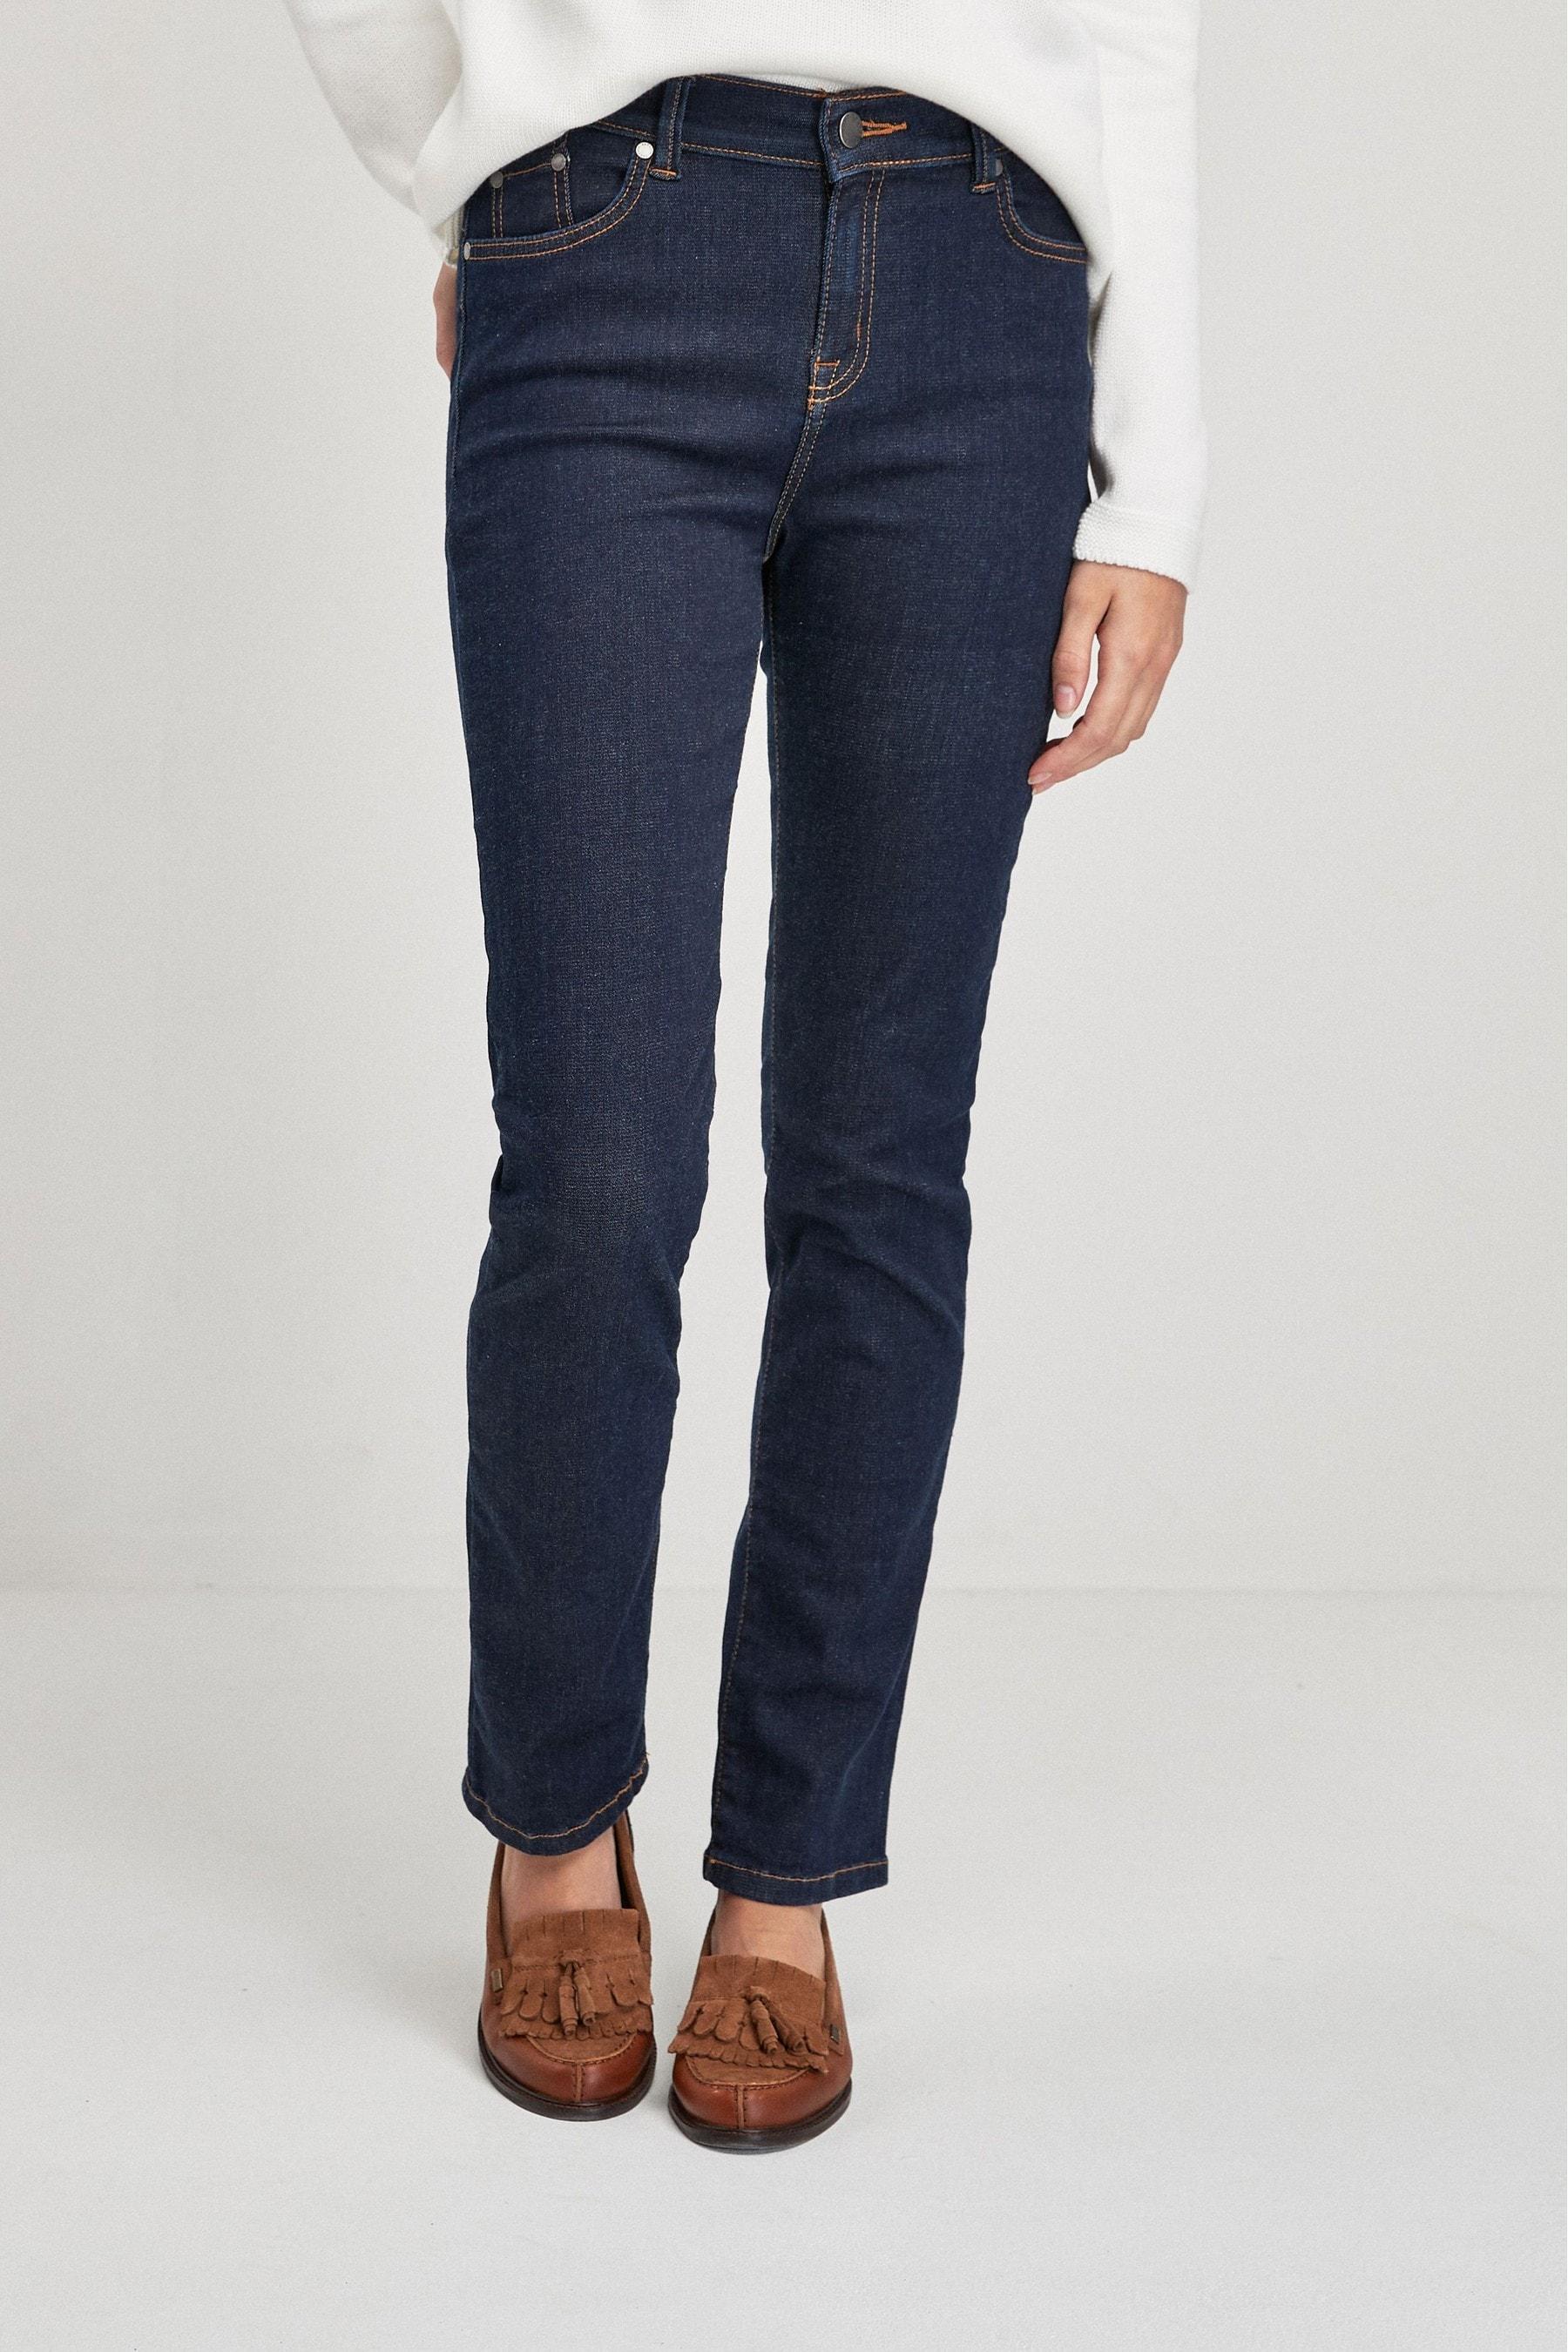 Barbour® Rinse Essential Slim Jeans (176640)